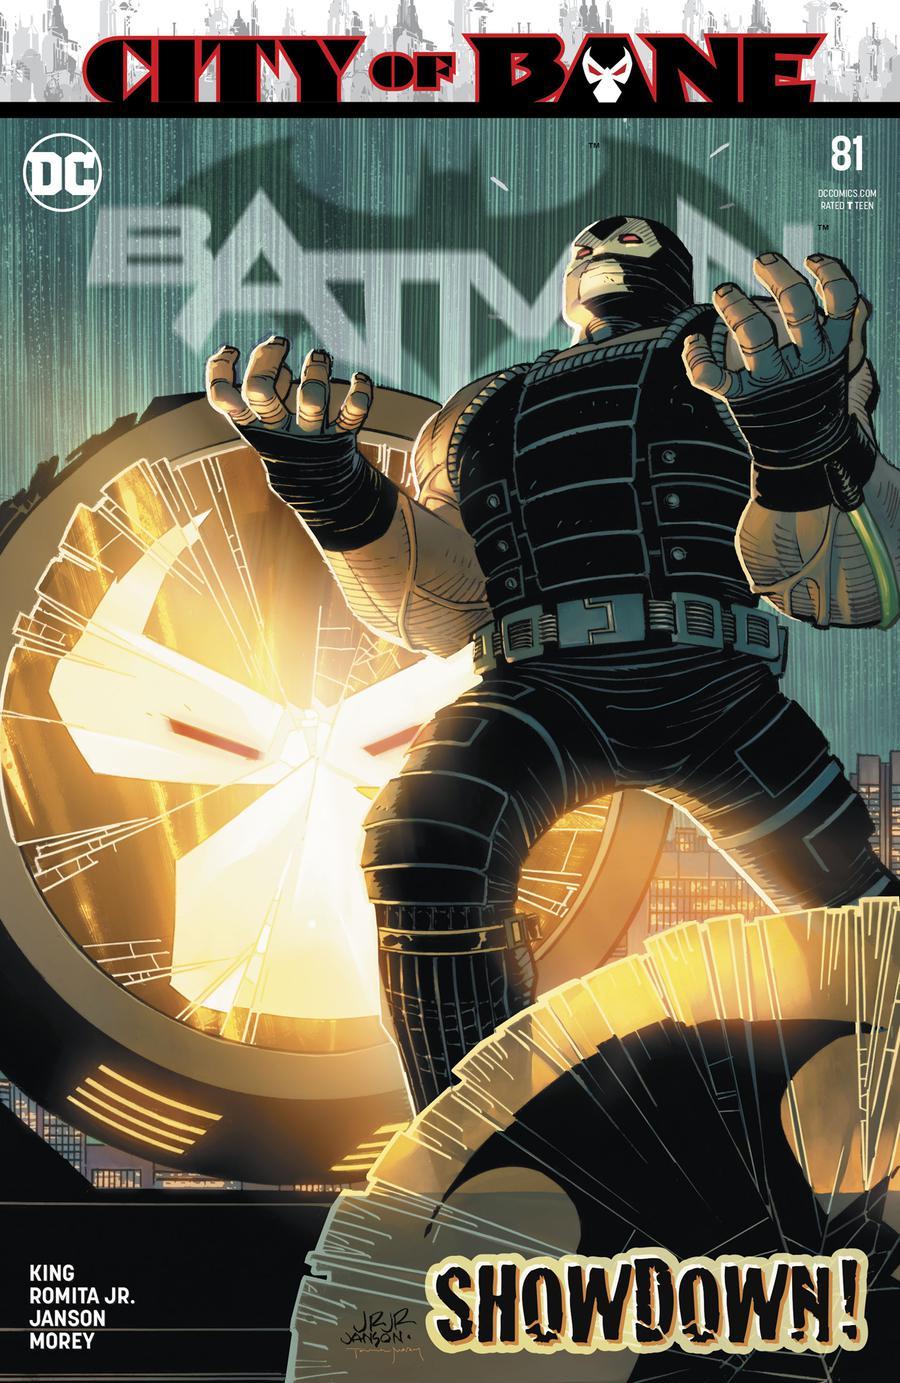 Batman Vol 3 #81 Cover A Regular John Romita Jr & Klaus Janson Cover